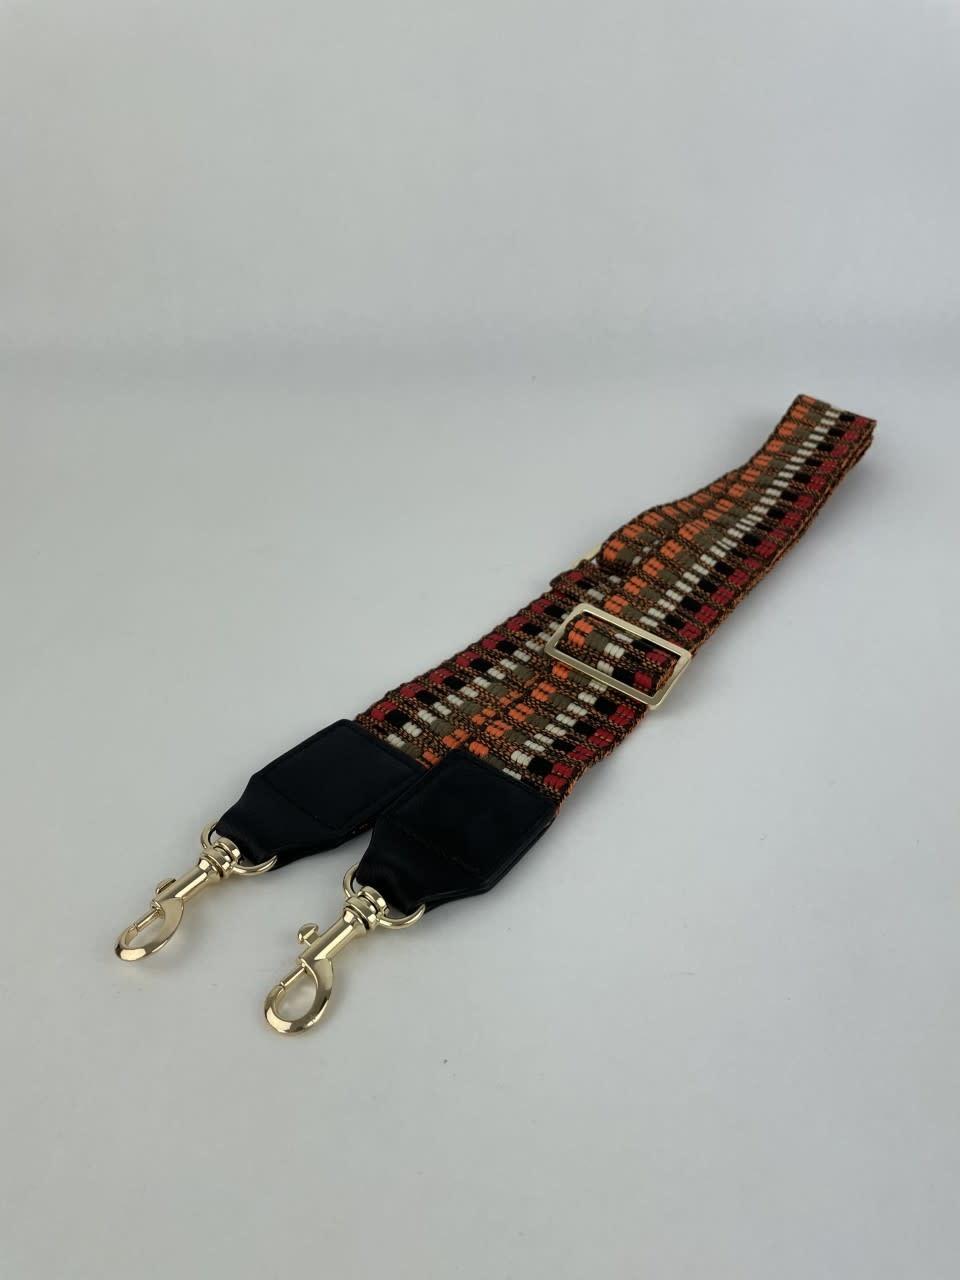 Ilmya woven shoulder strap Orange-1